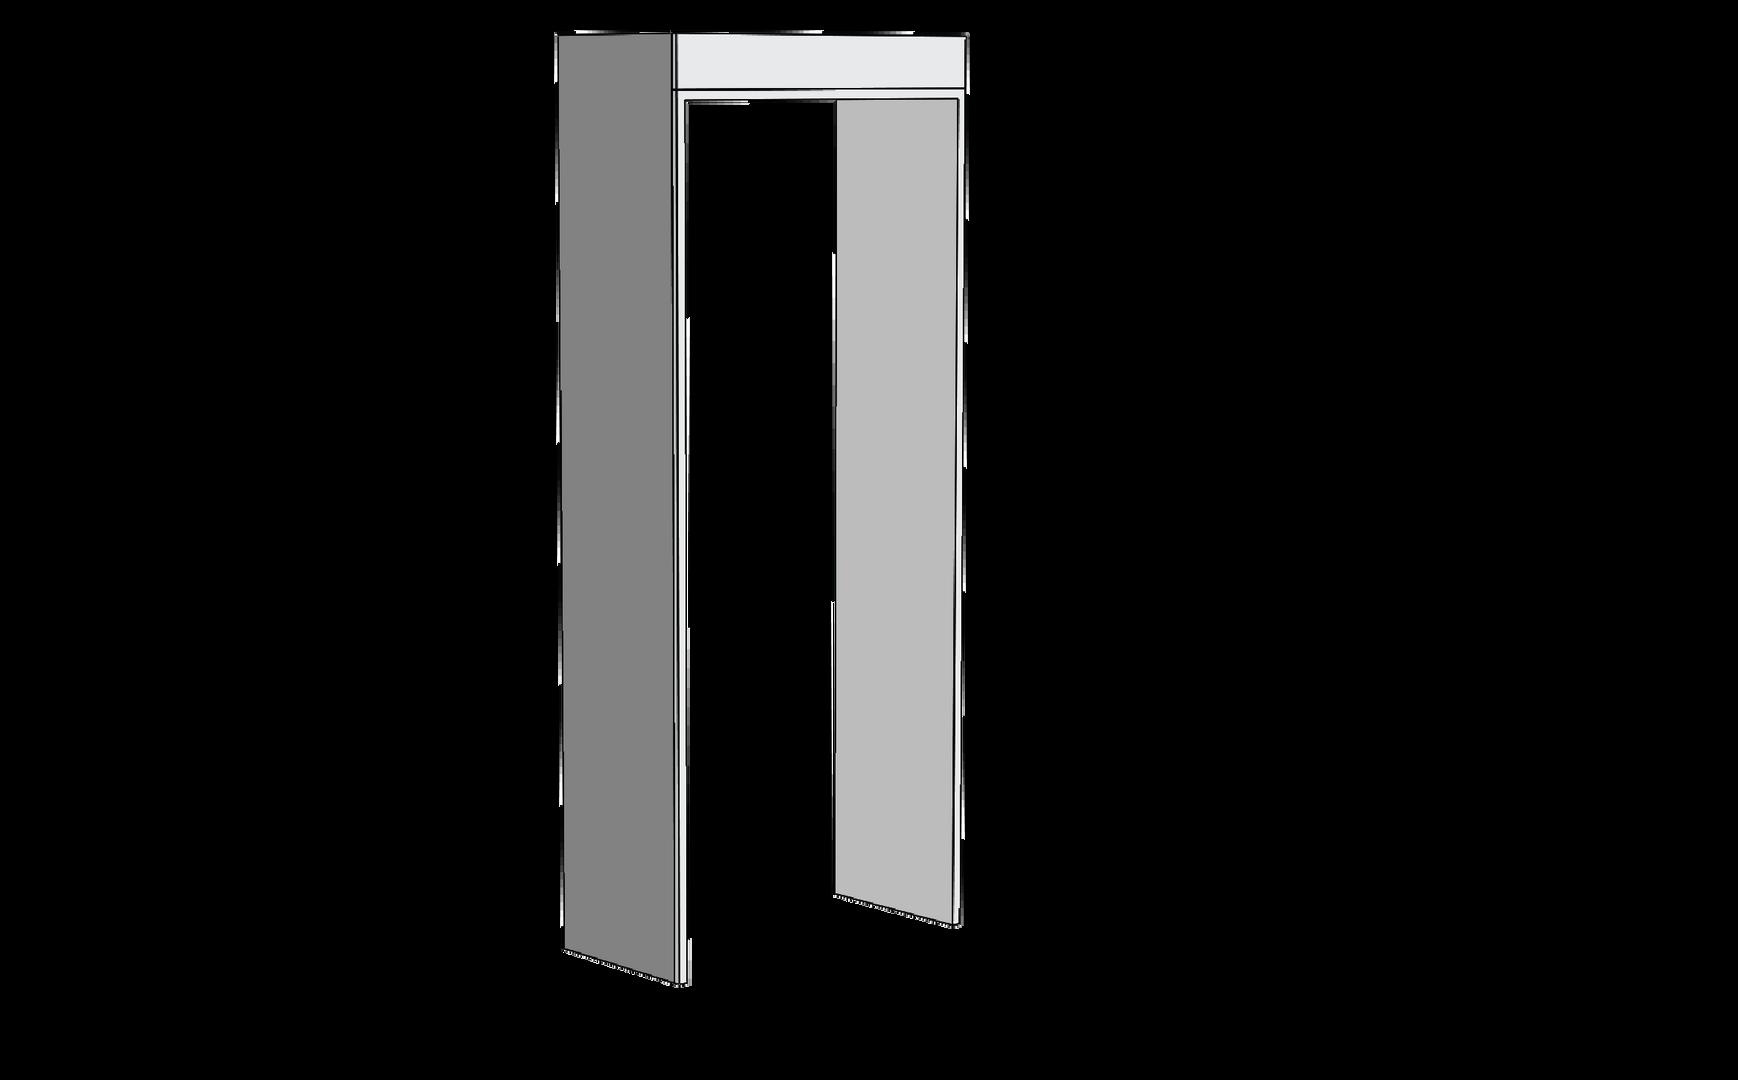 Unit Code: TRW1